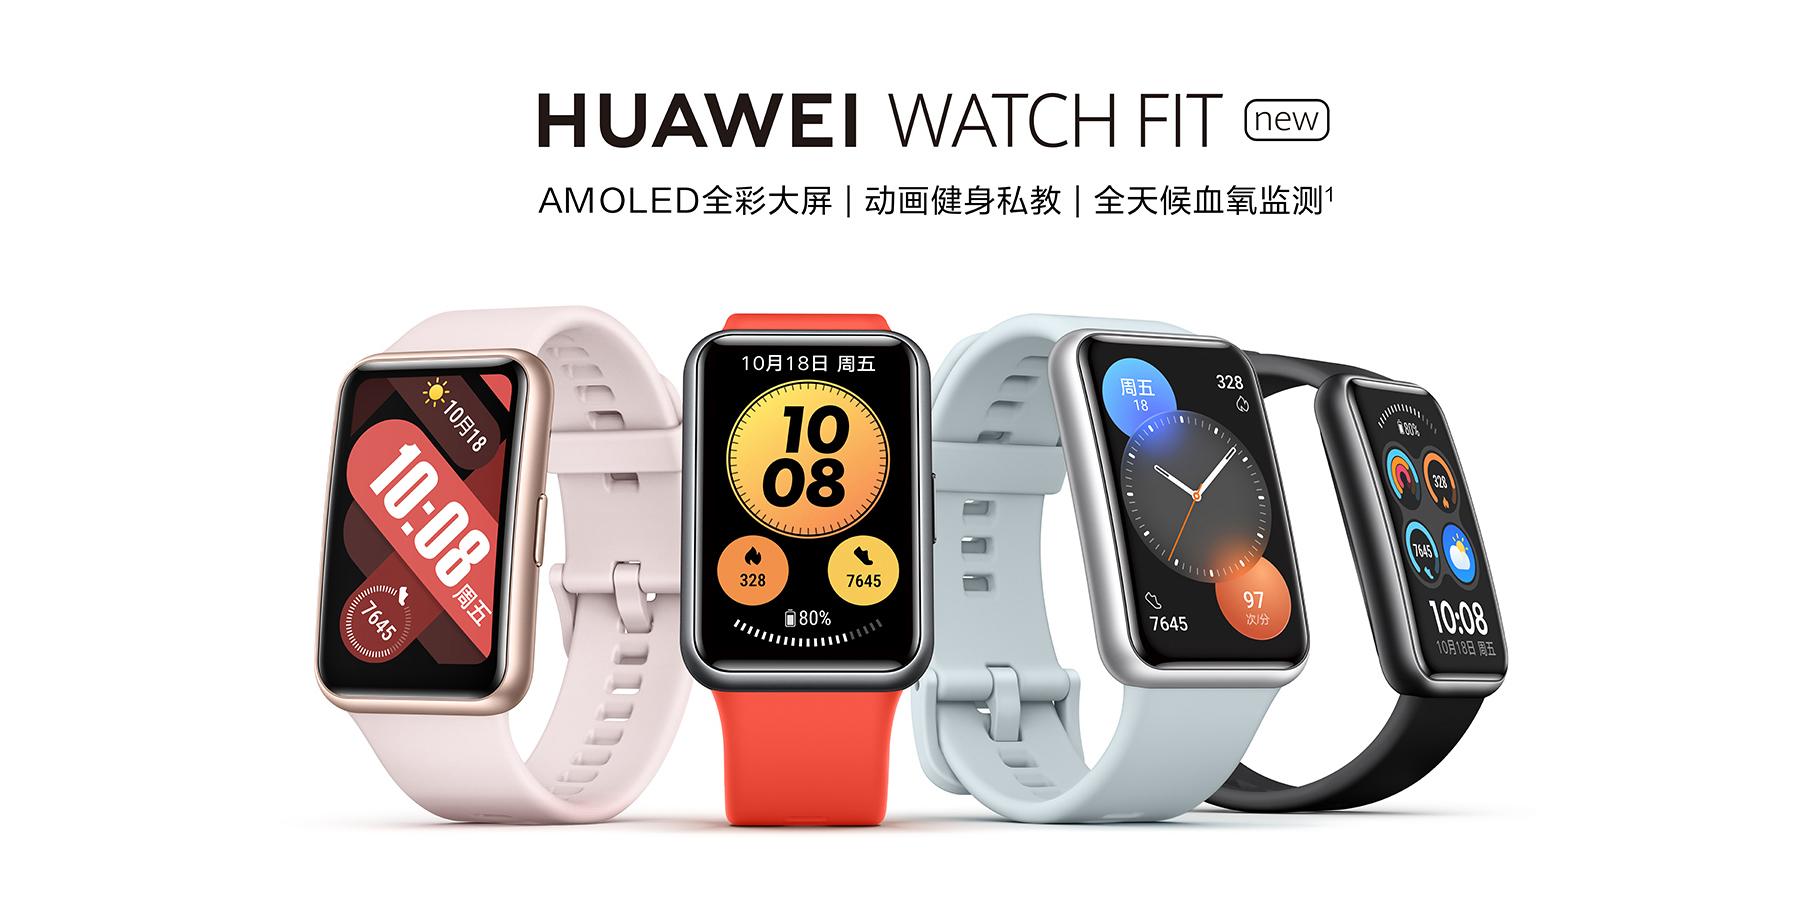 watch fit new.jpg